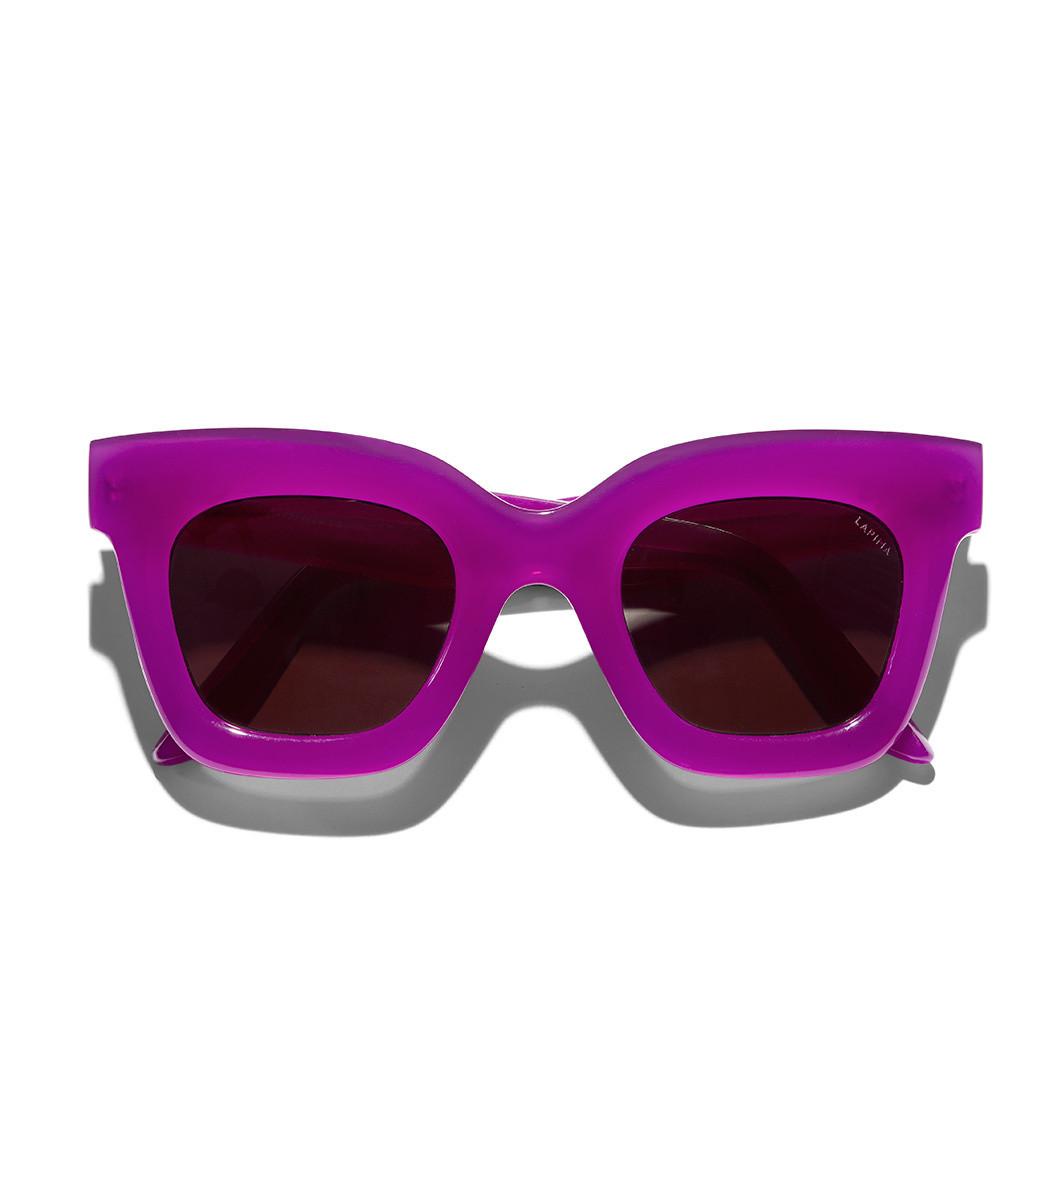 LAPIMA Lisa Sunglasses in Ultra Violet